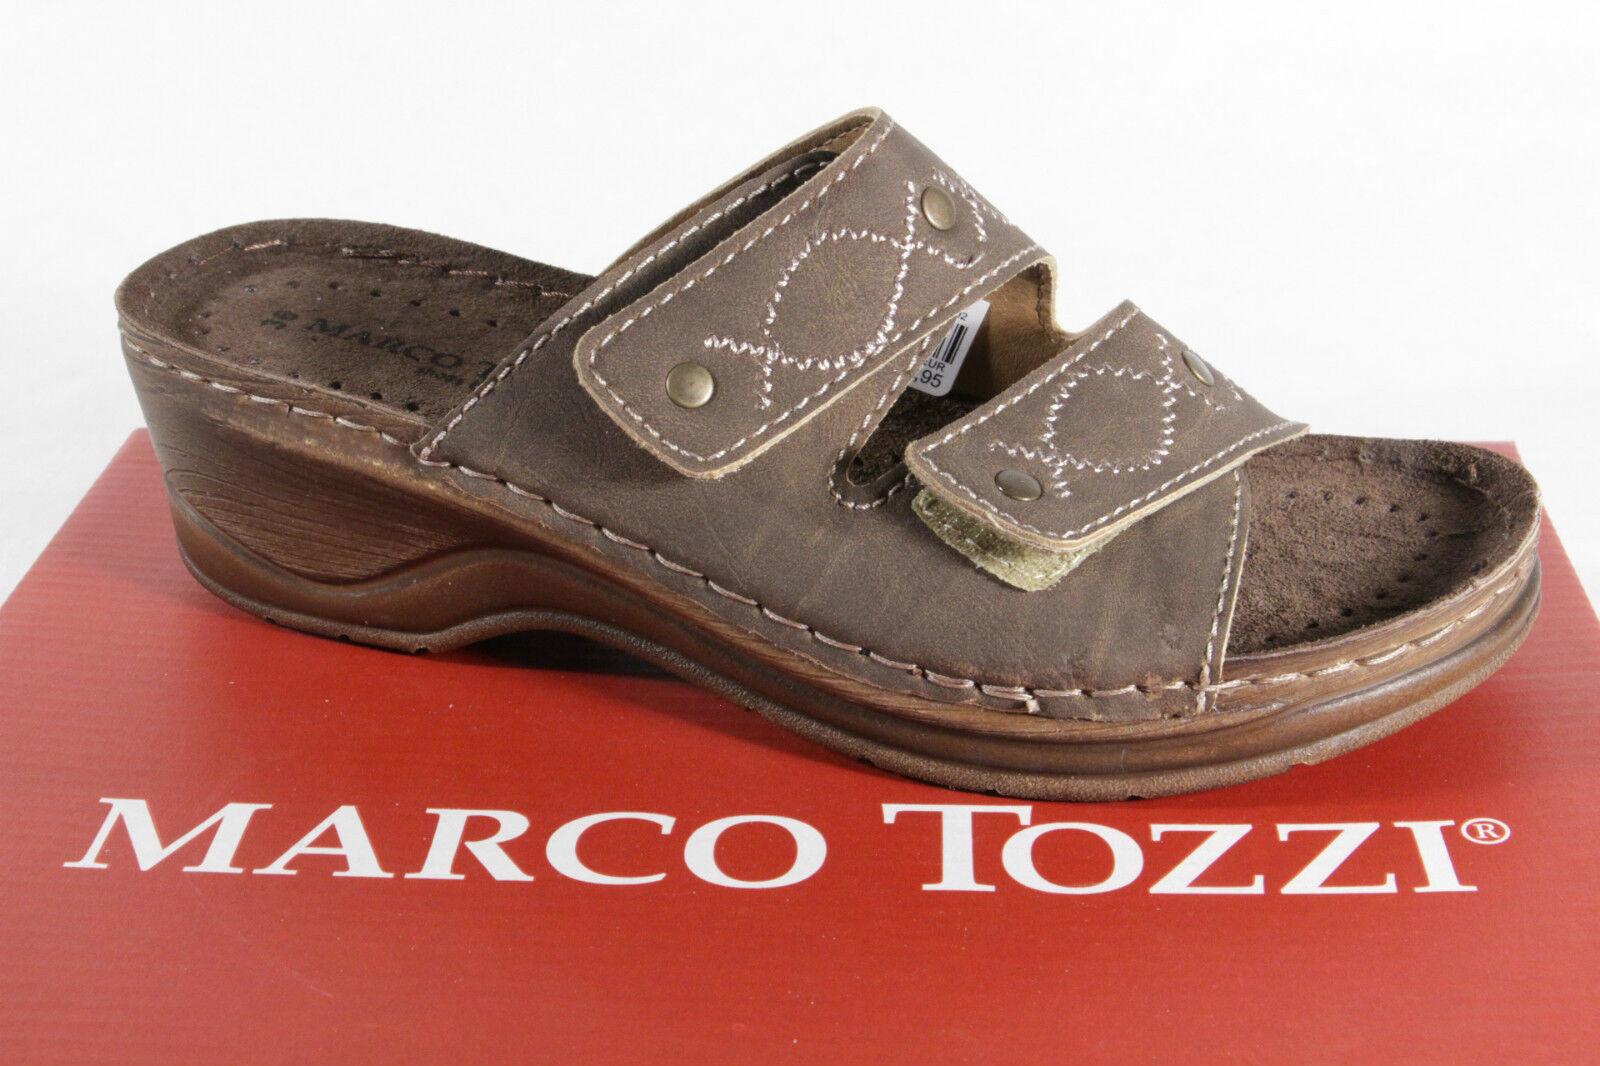 Marco Marco Marco Tozzi Zapato Abierto, Marrón 27502 Nuevo  salida